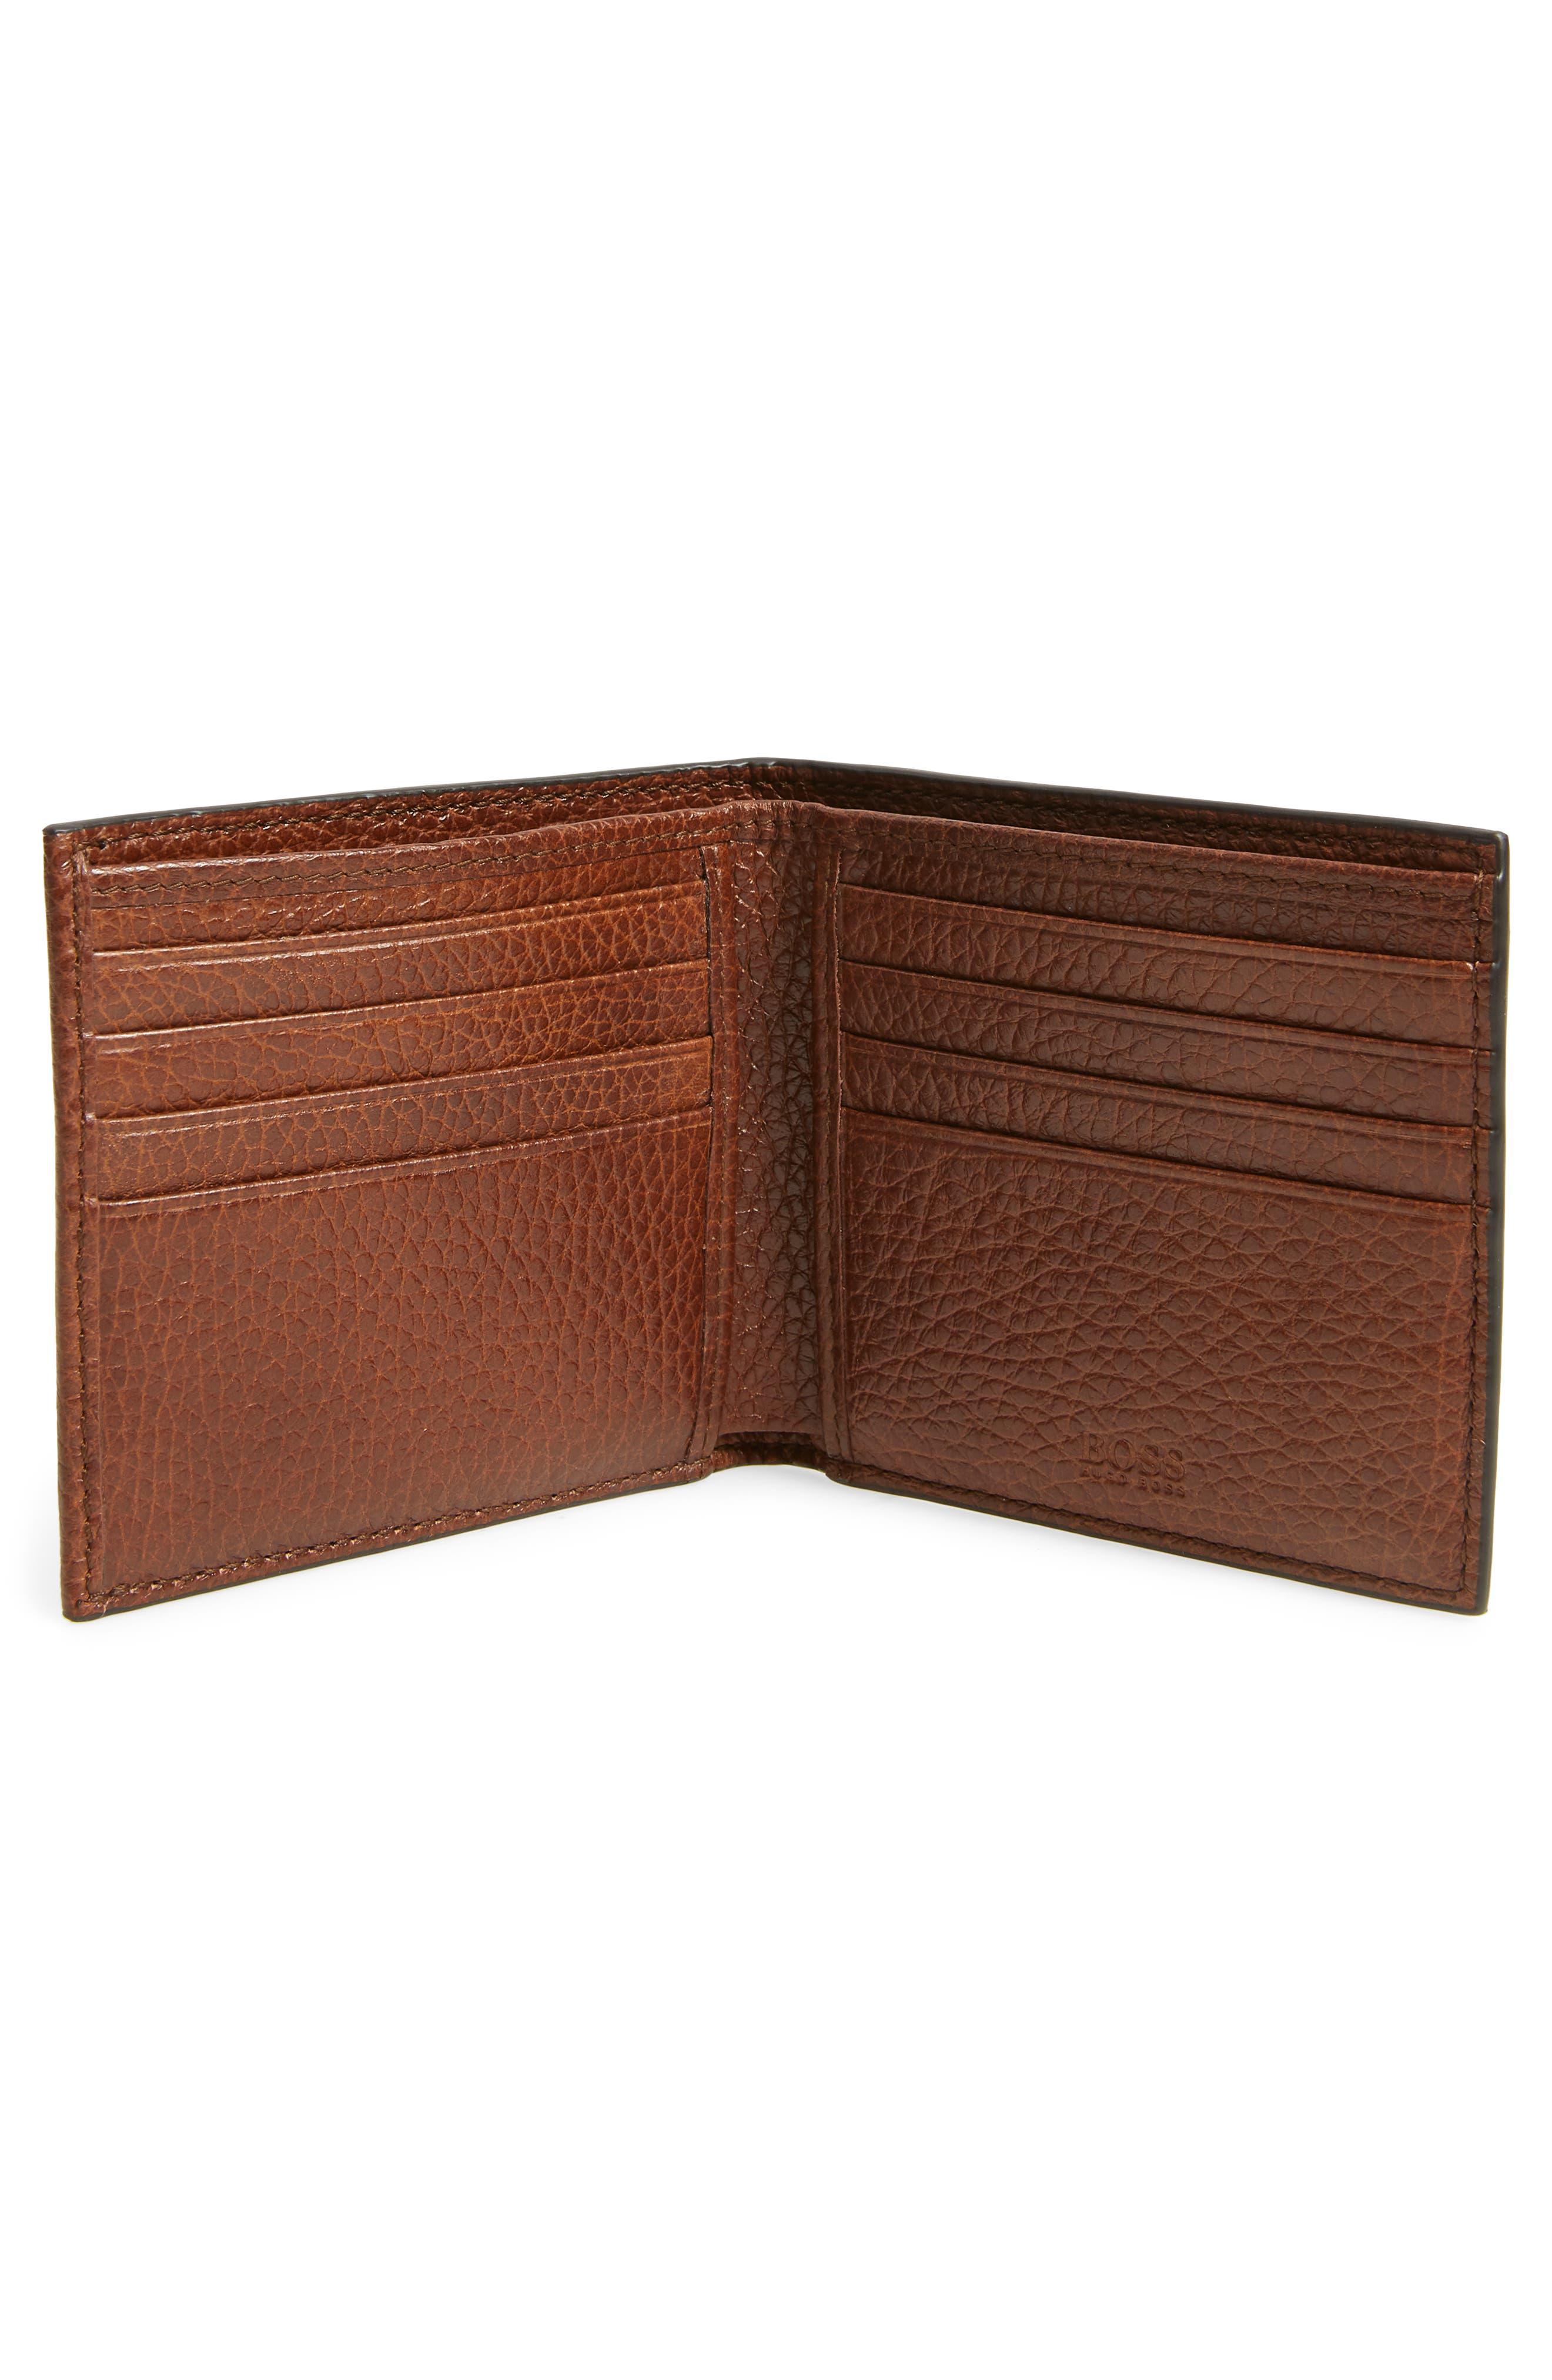 Traveller Leather Wallet,                             Alternate thumbnail 2, color,                             MEDIUM BROWN